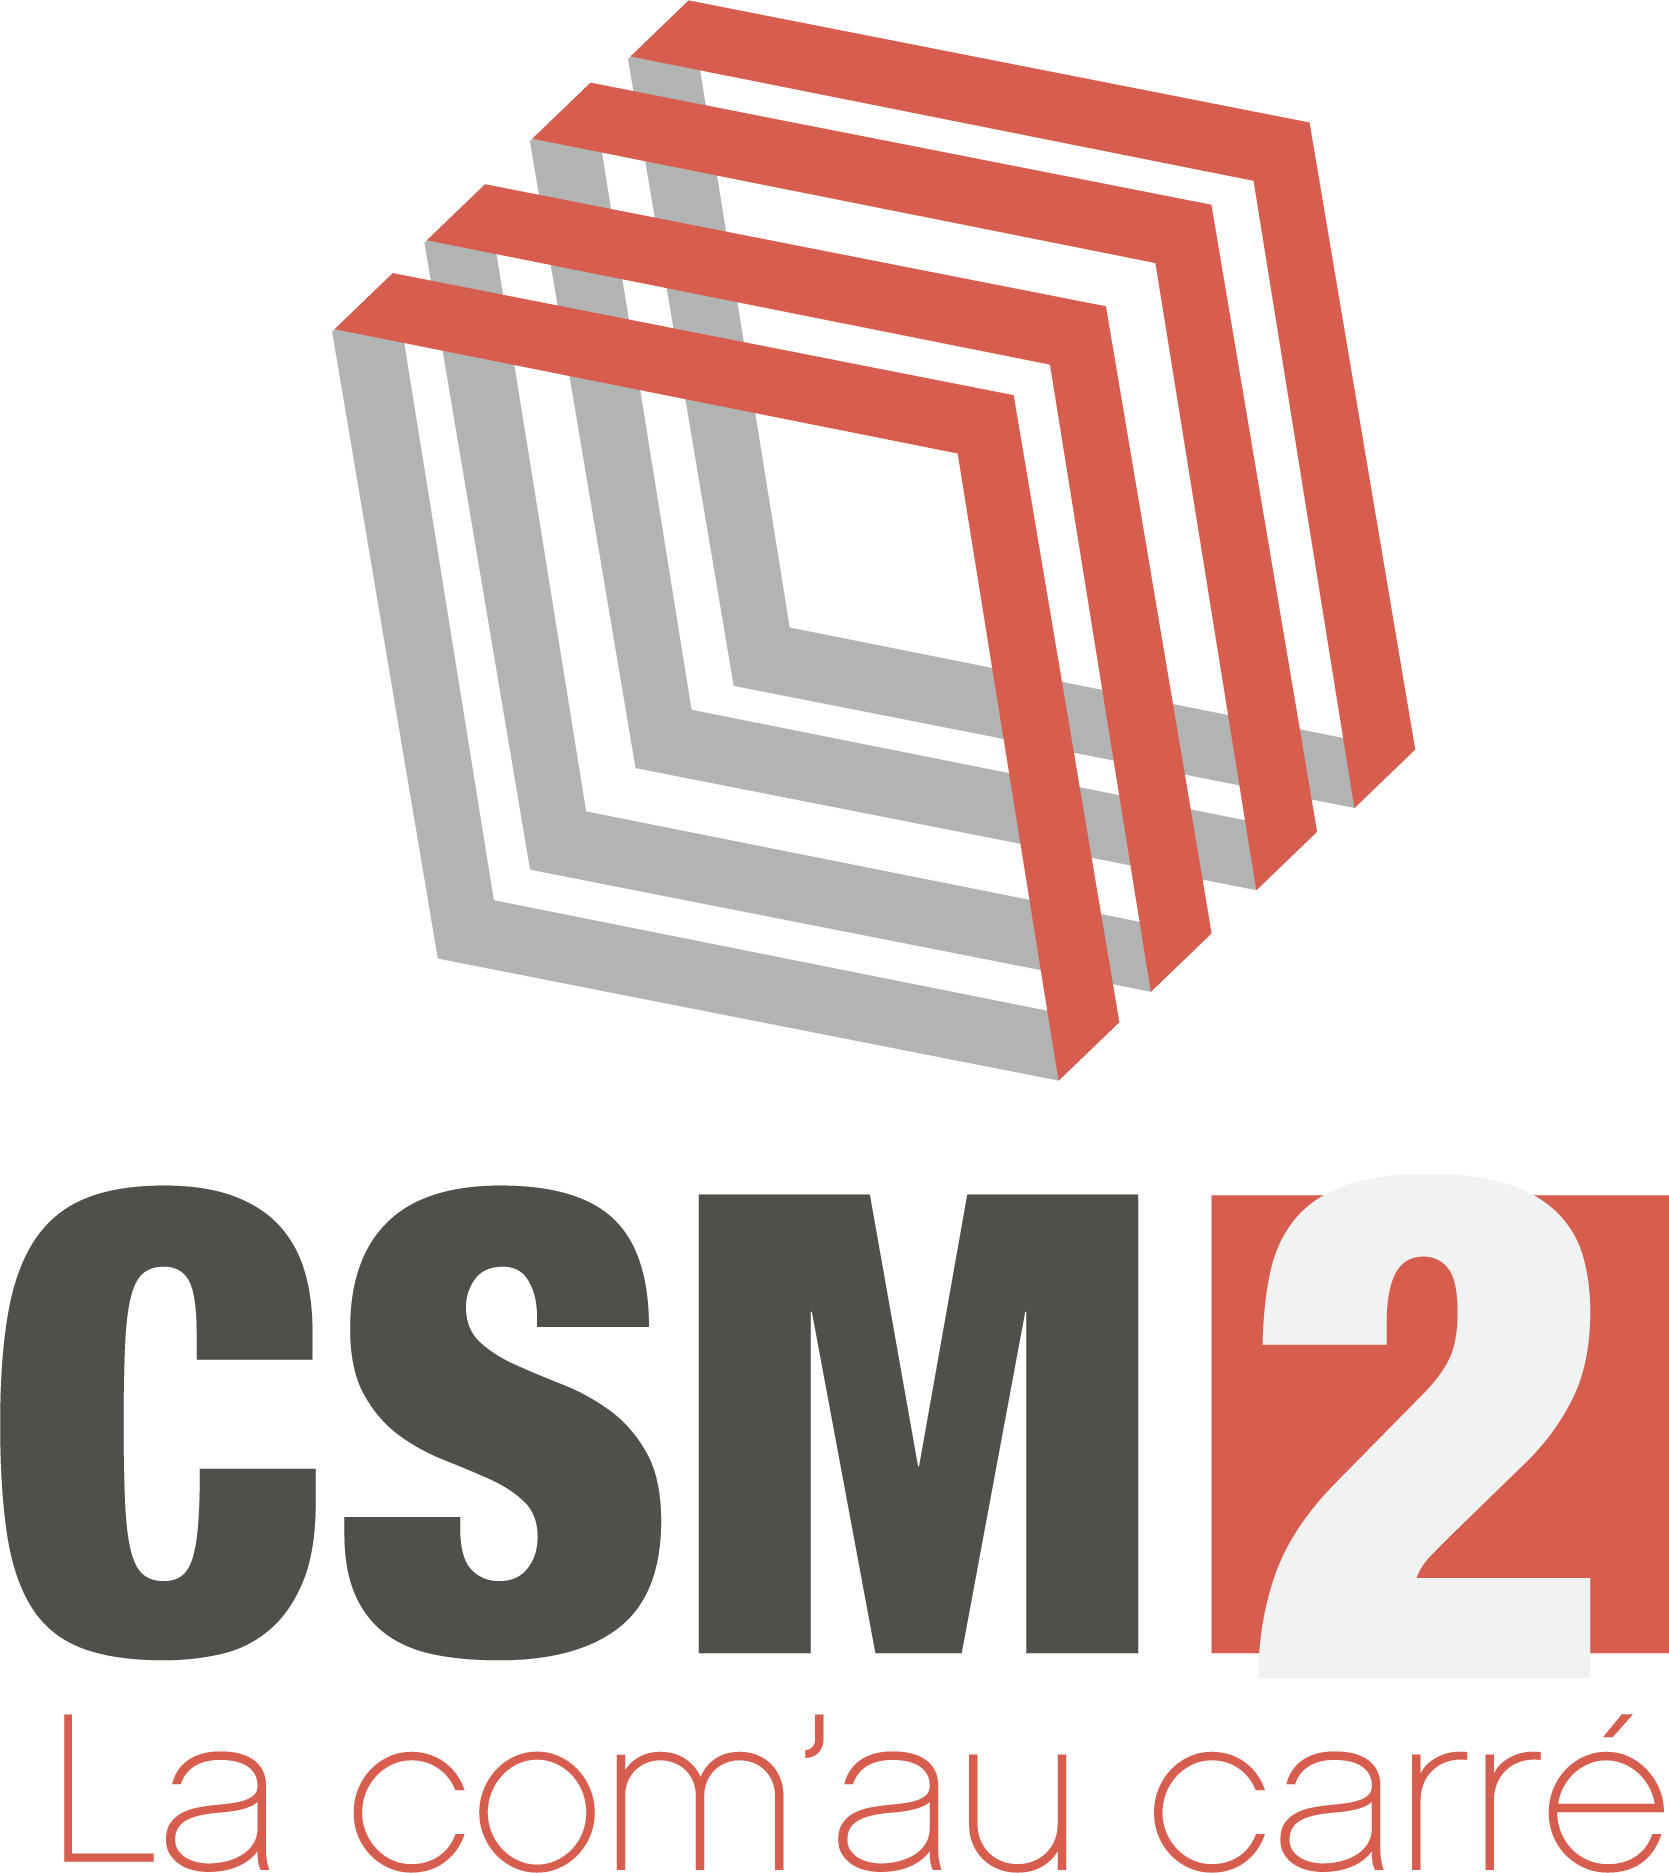 CSM2 Communication